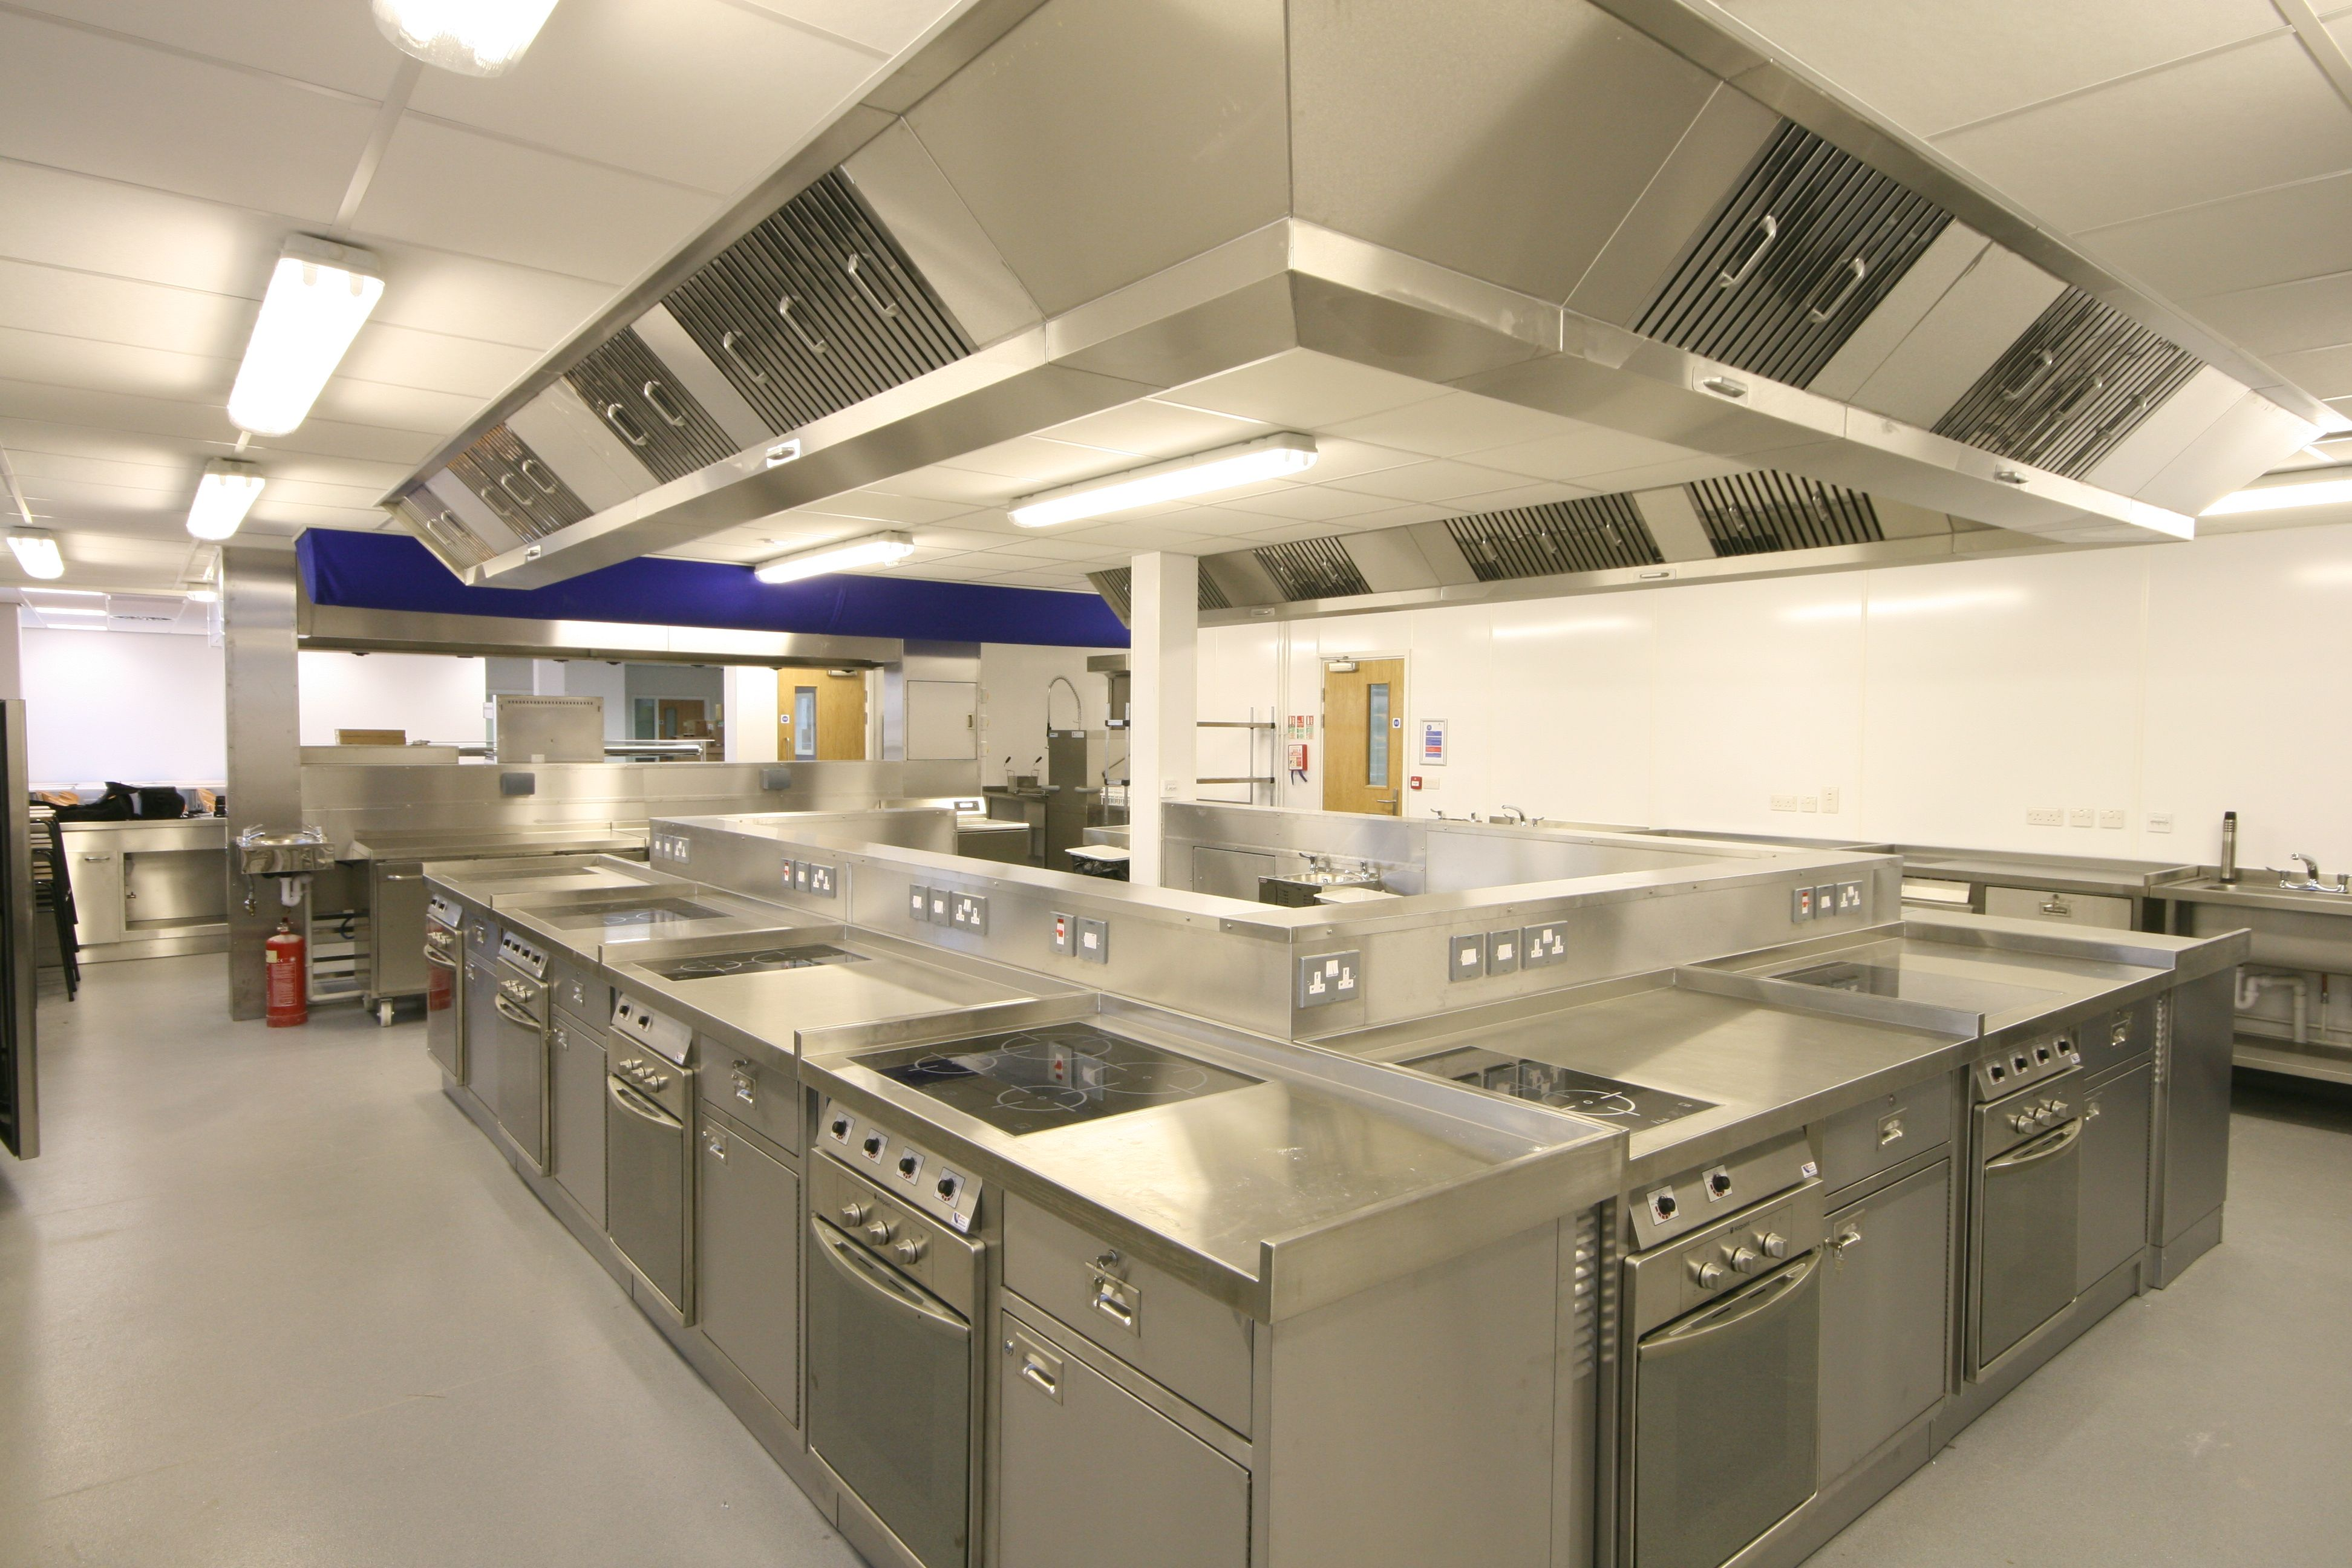 professional kitchen design - Professional Kitchen